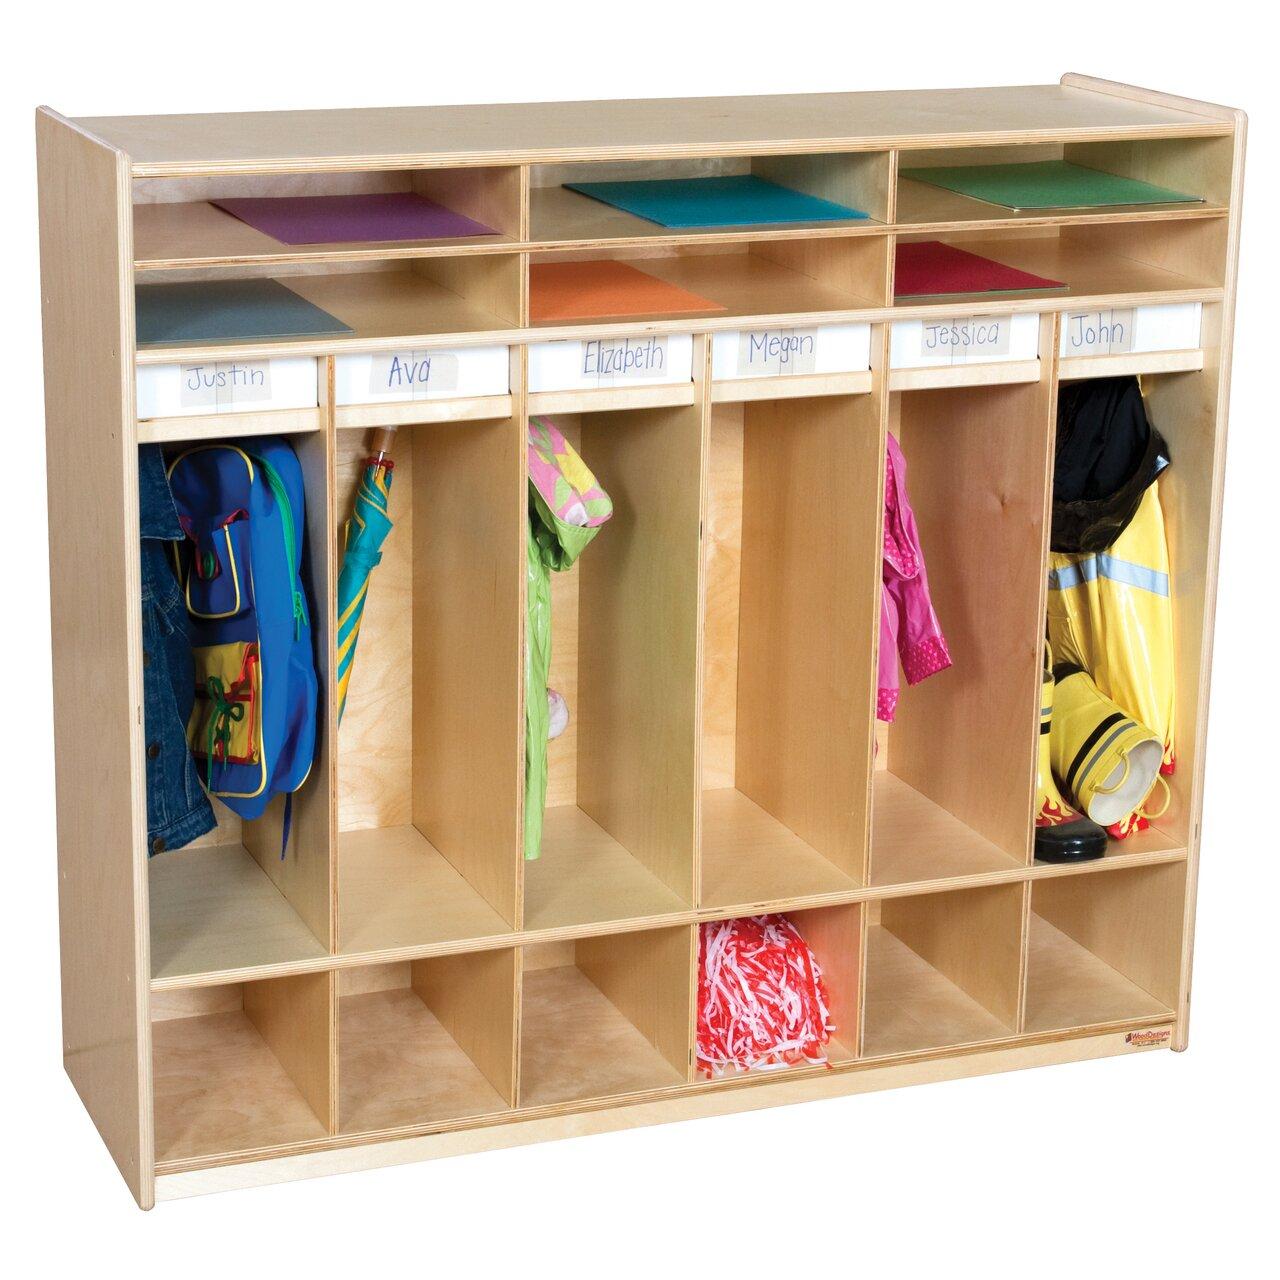 Kitchen Supplies Table With Storage Lockers